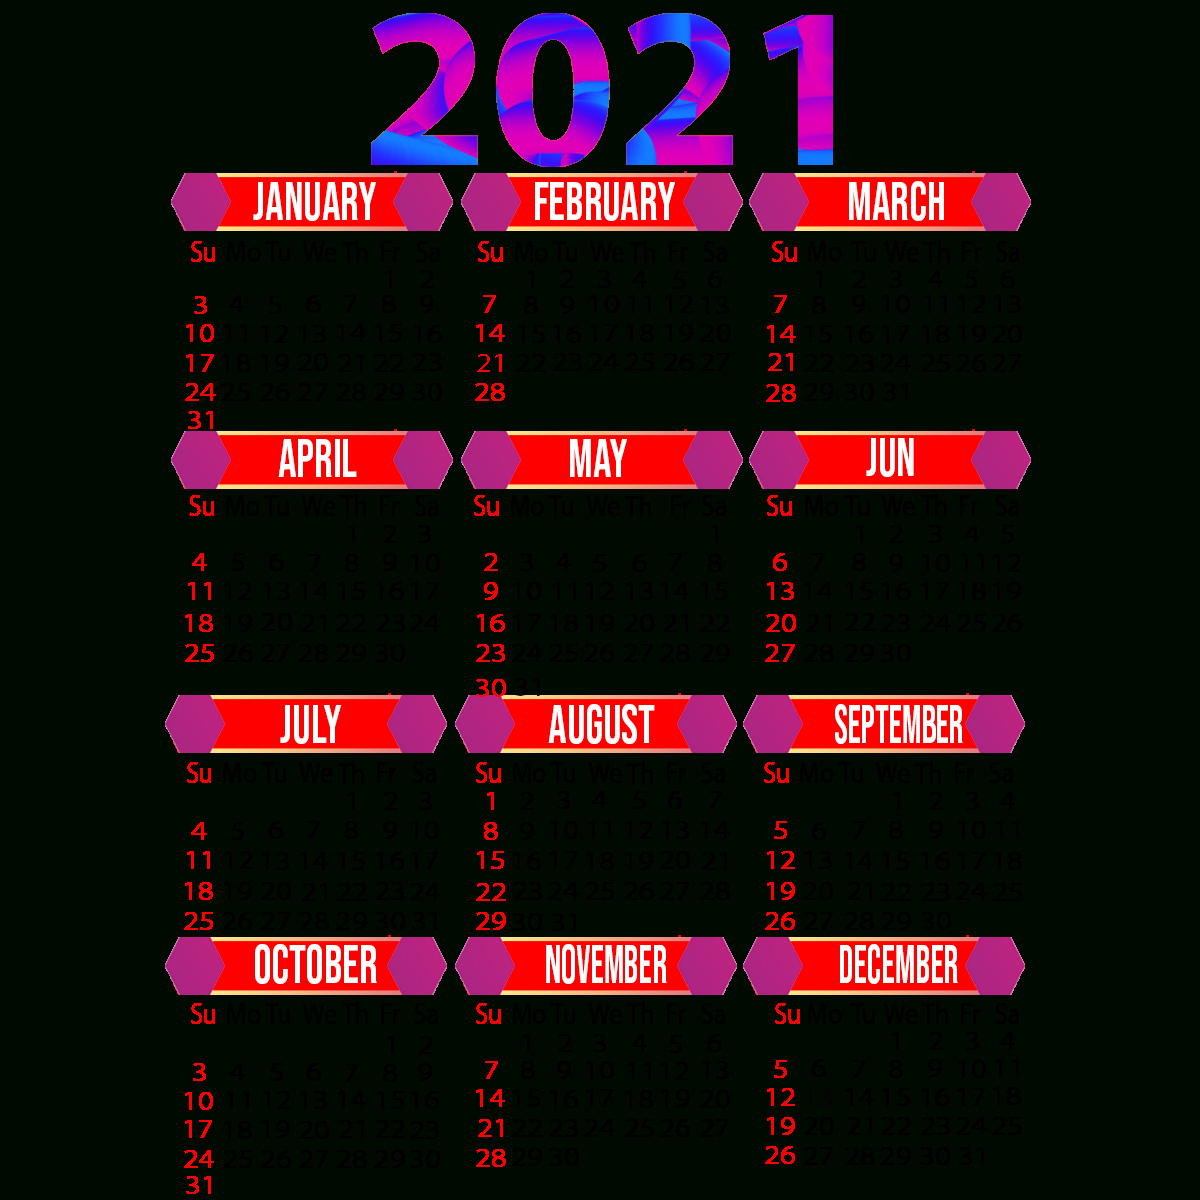 2021 Calendar Printable | 12 Months All In One | Calendar 2021